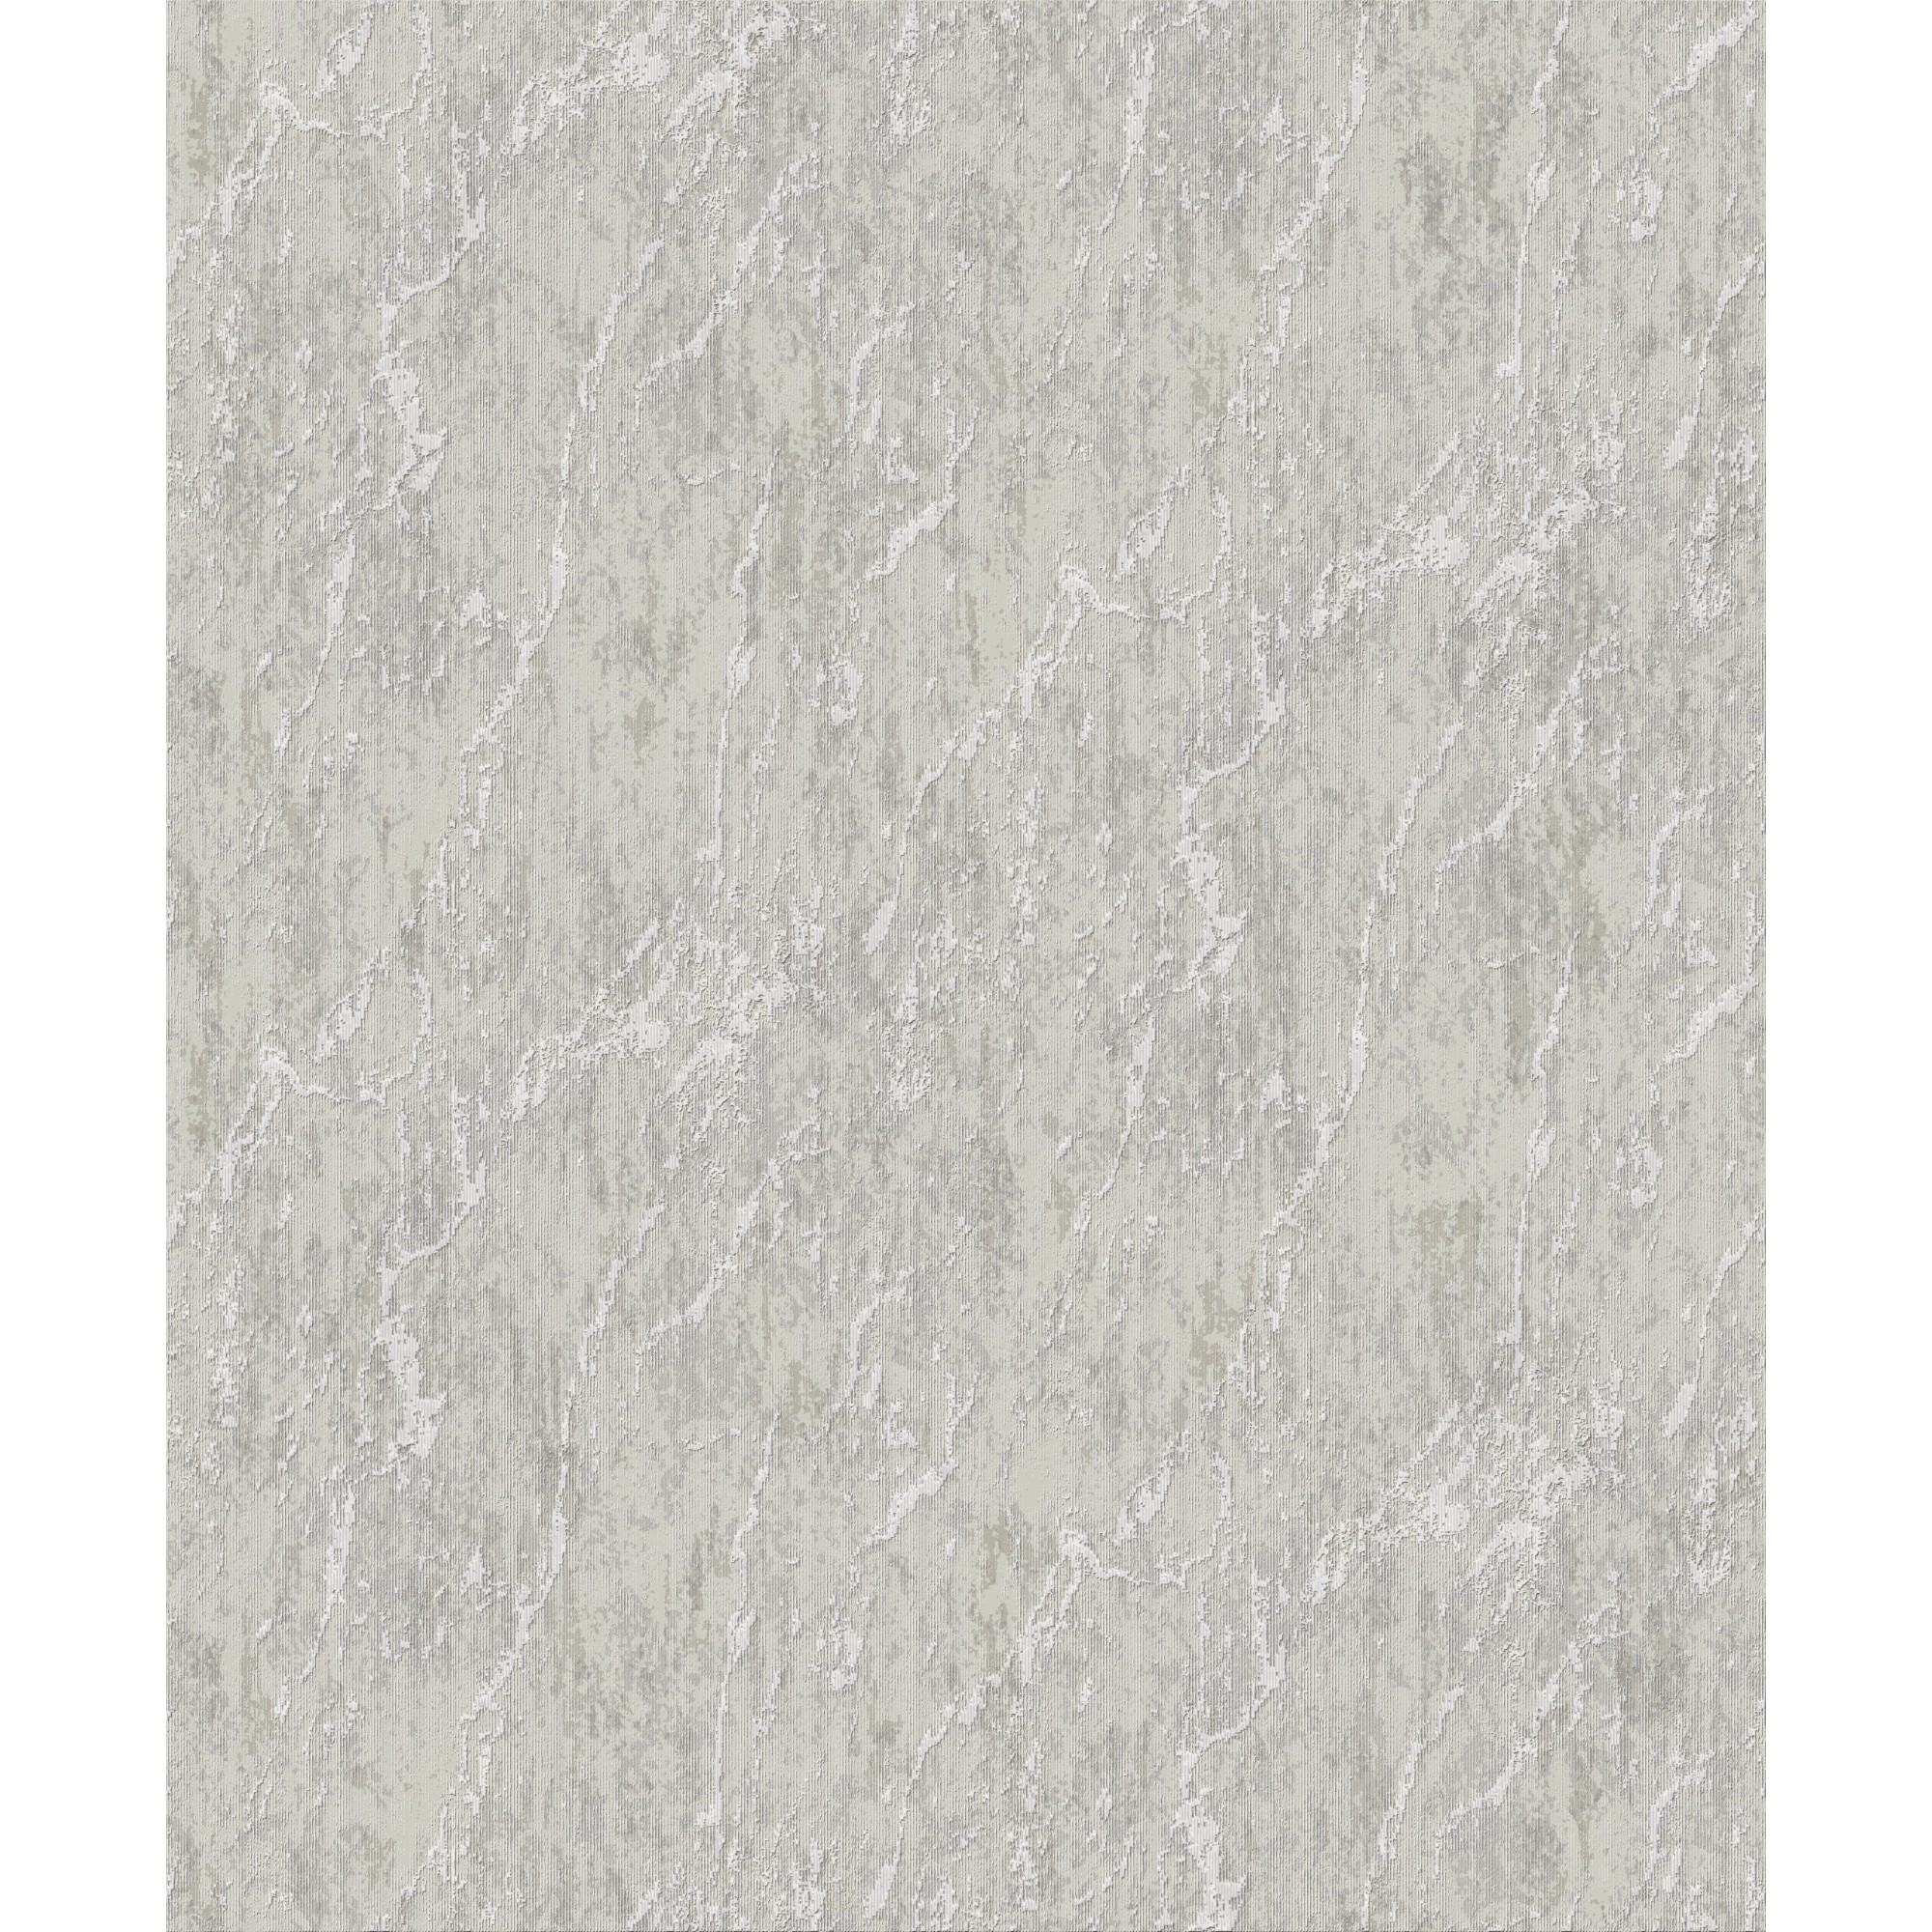 Papel de Parede 53cm x 10m Nonwoven Texturizado 3120 - Jolie